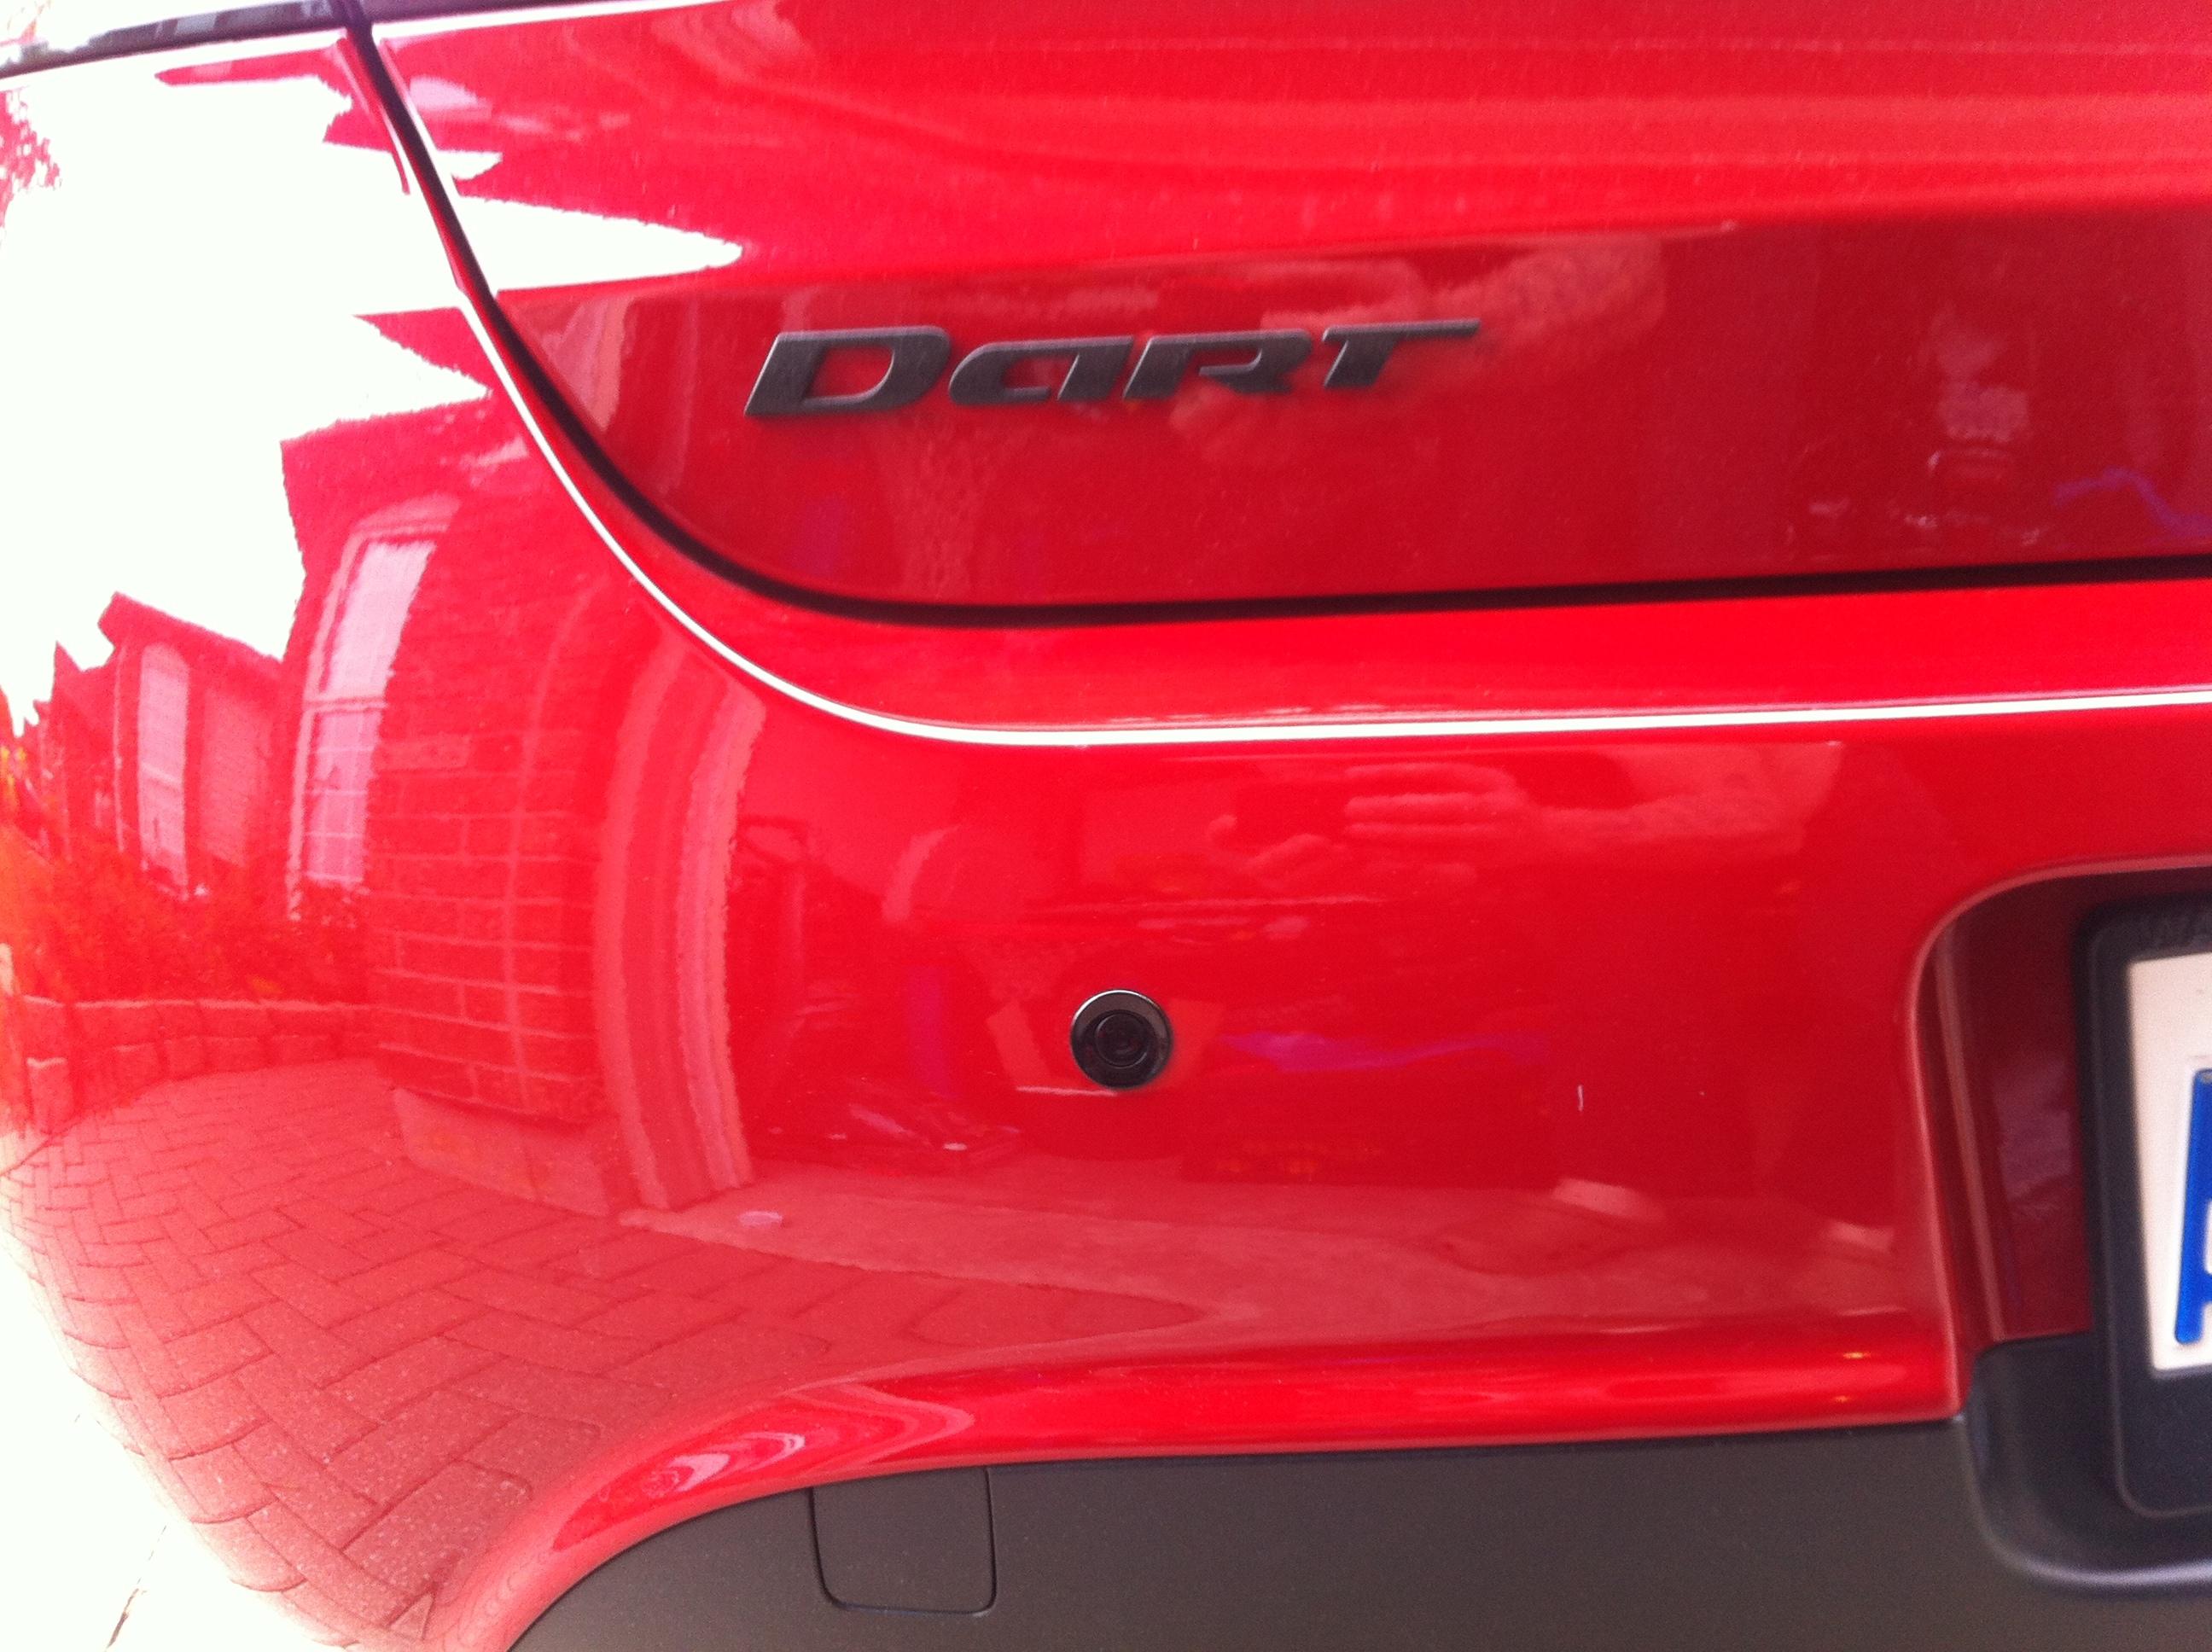 Dodge Dart Tail Light Wiring Schematic Diagram Lights Reverse Wire For Park Sensor Or 2013 Durango